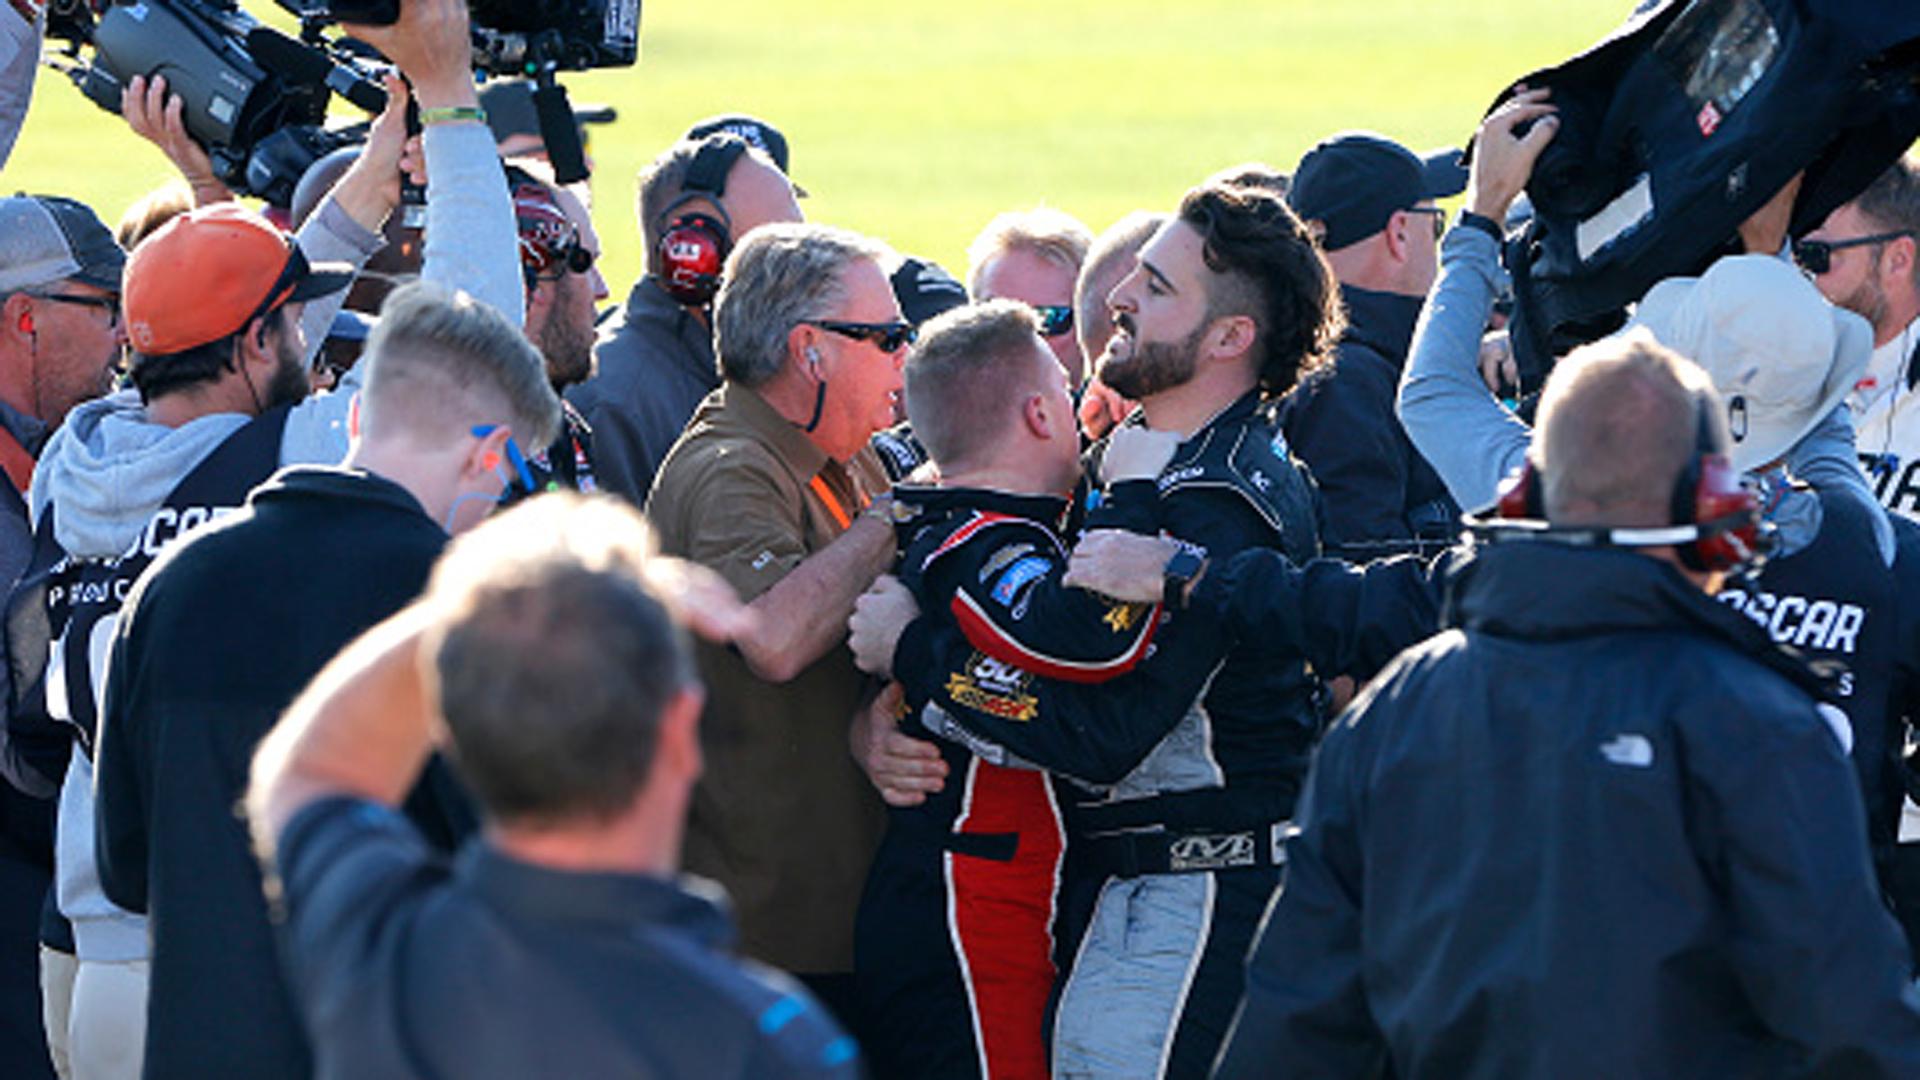 Must See: Custer, Reddick get physical after NASCAR Xfinity race – TSN